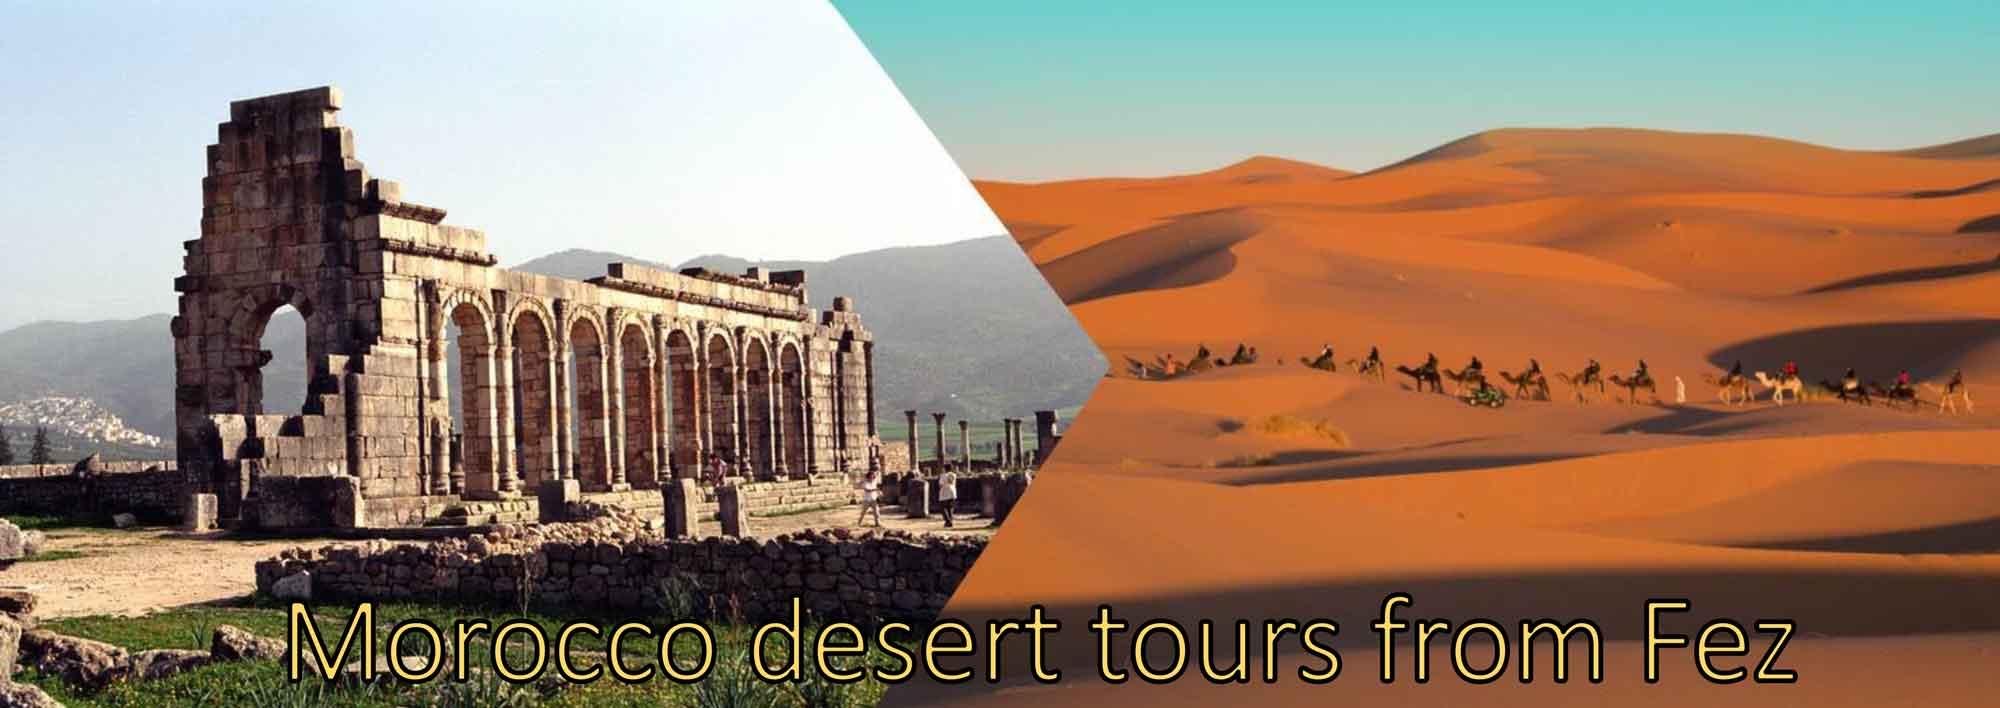 Morocco desert tours from Fez